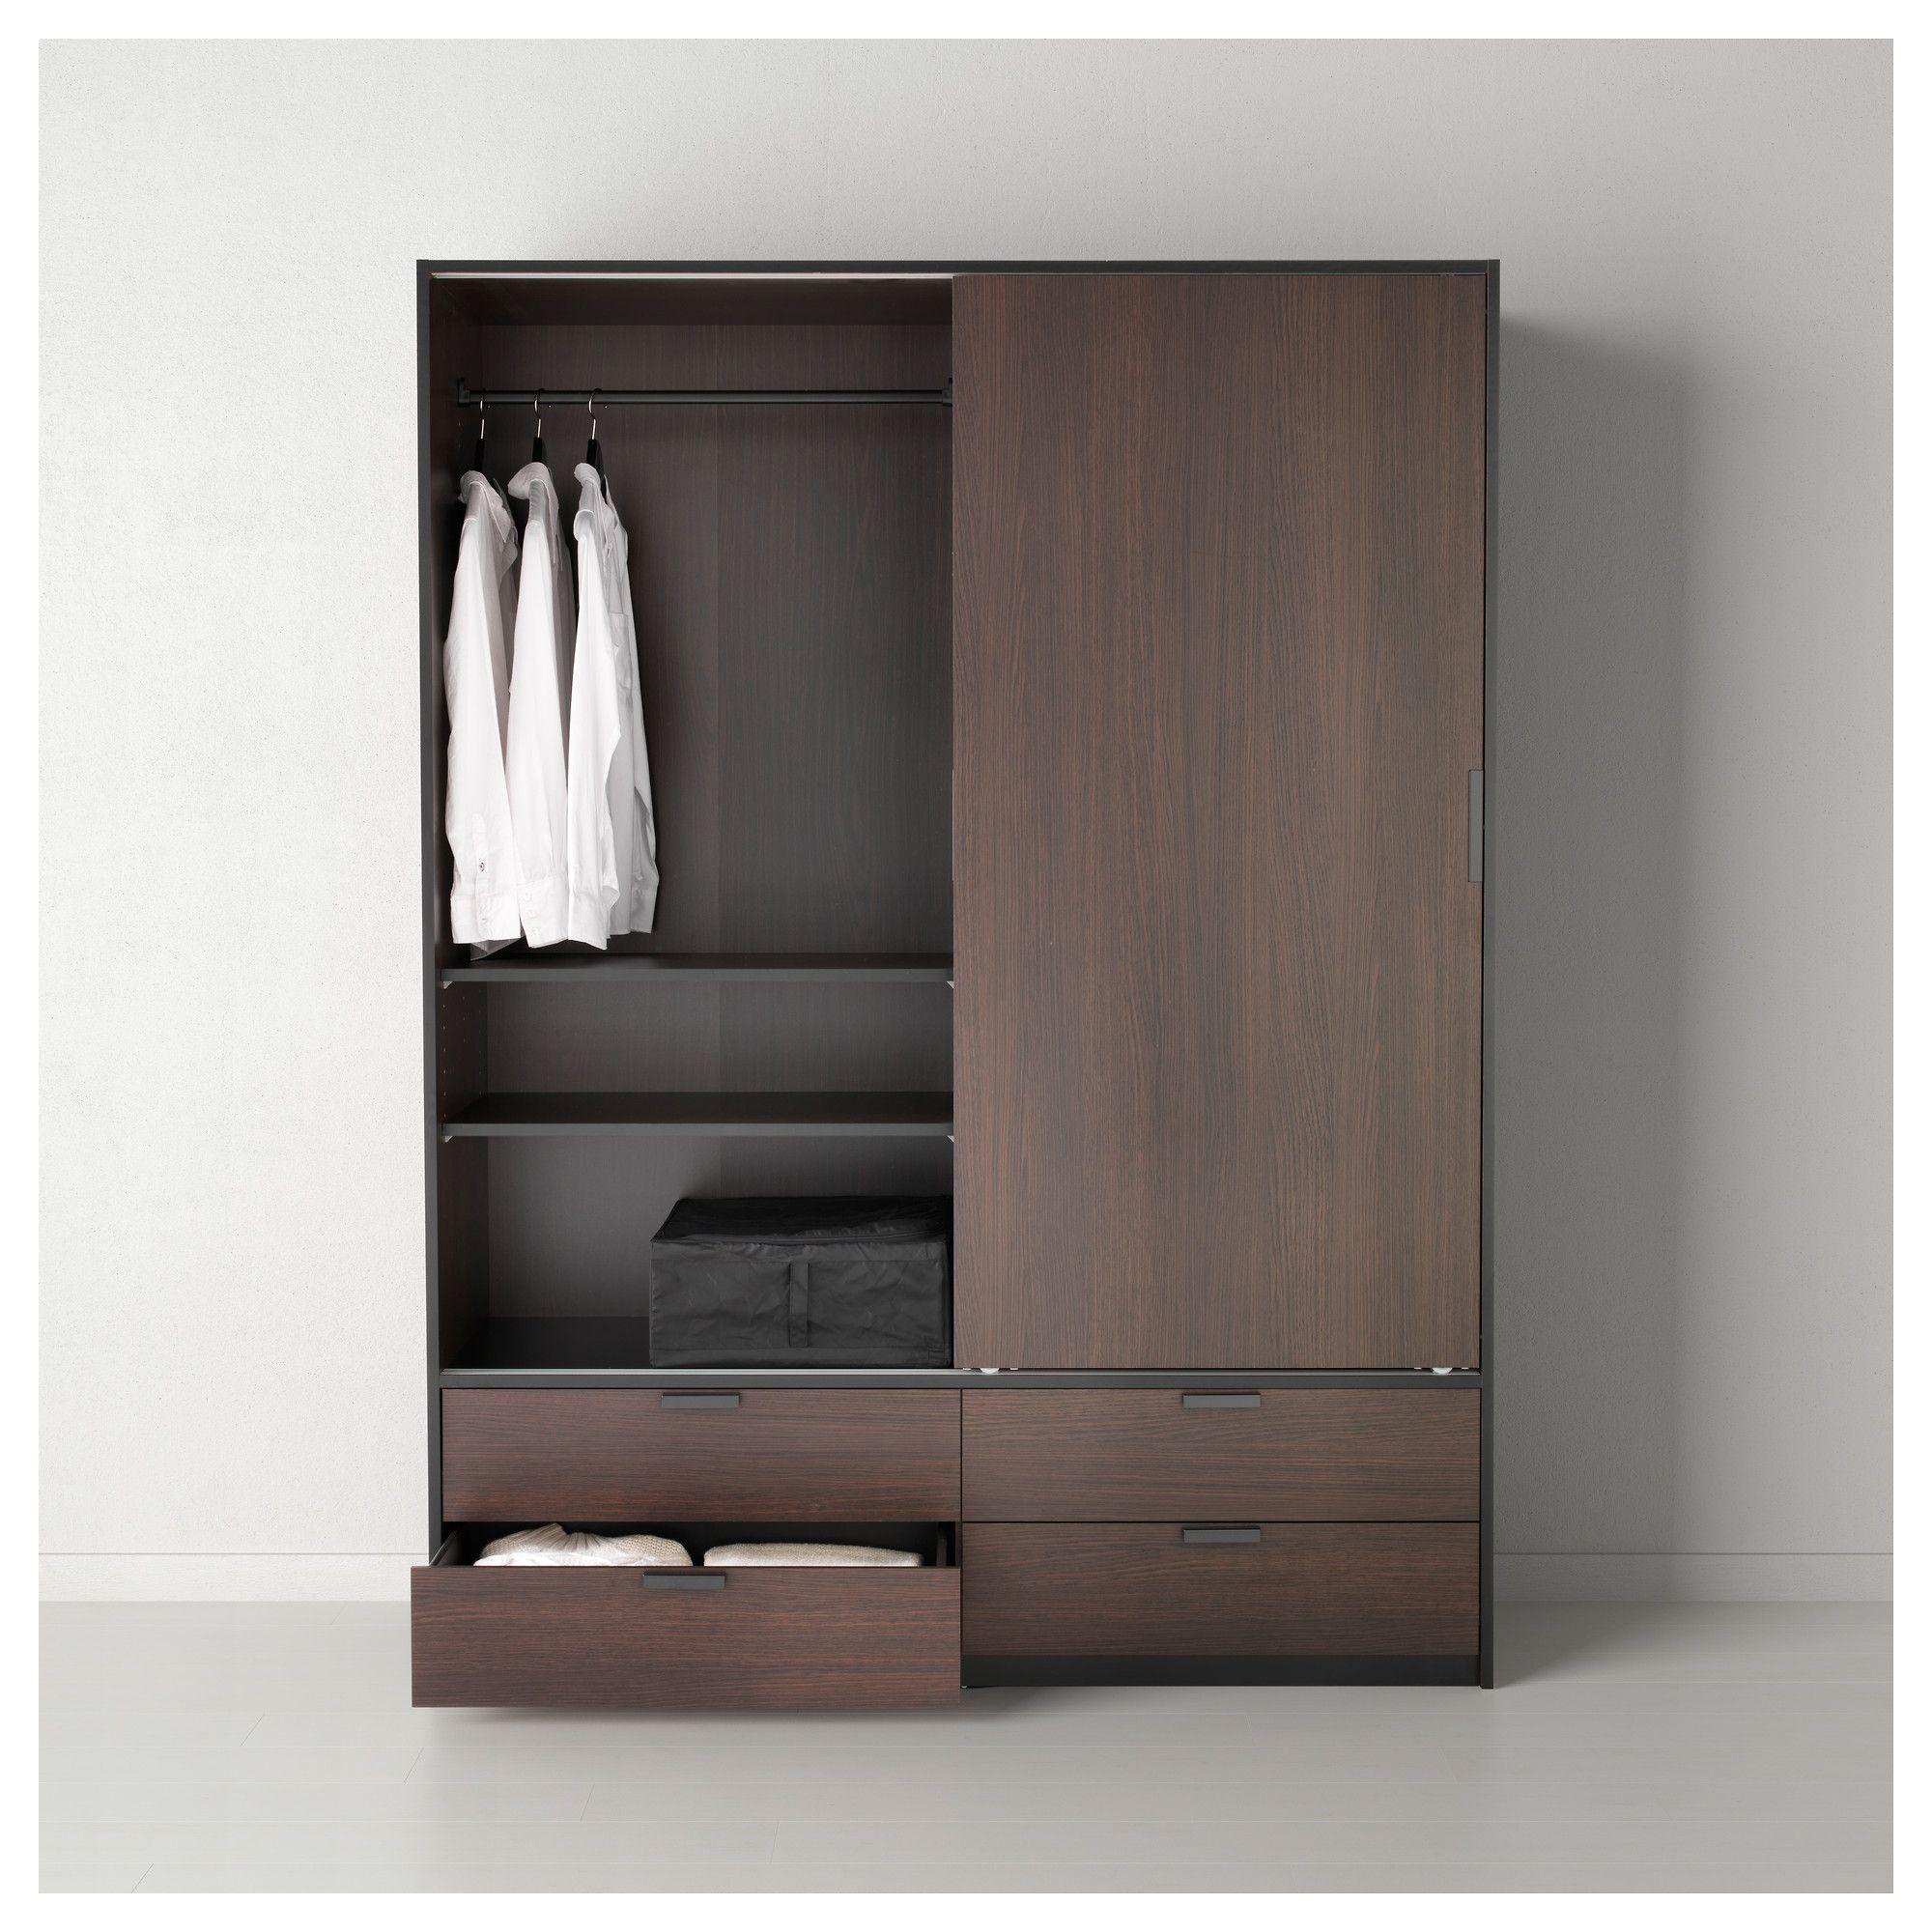 TRYSIL Ντουλάπα με συρόμ πόρτες/4 συρτάρια - IKEA   Wardrobe ...